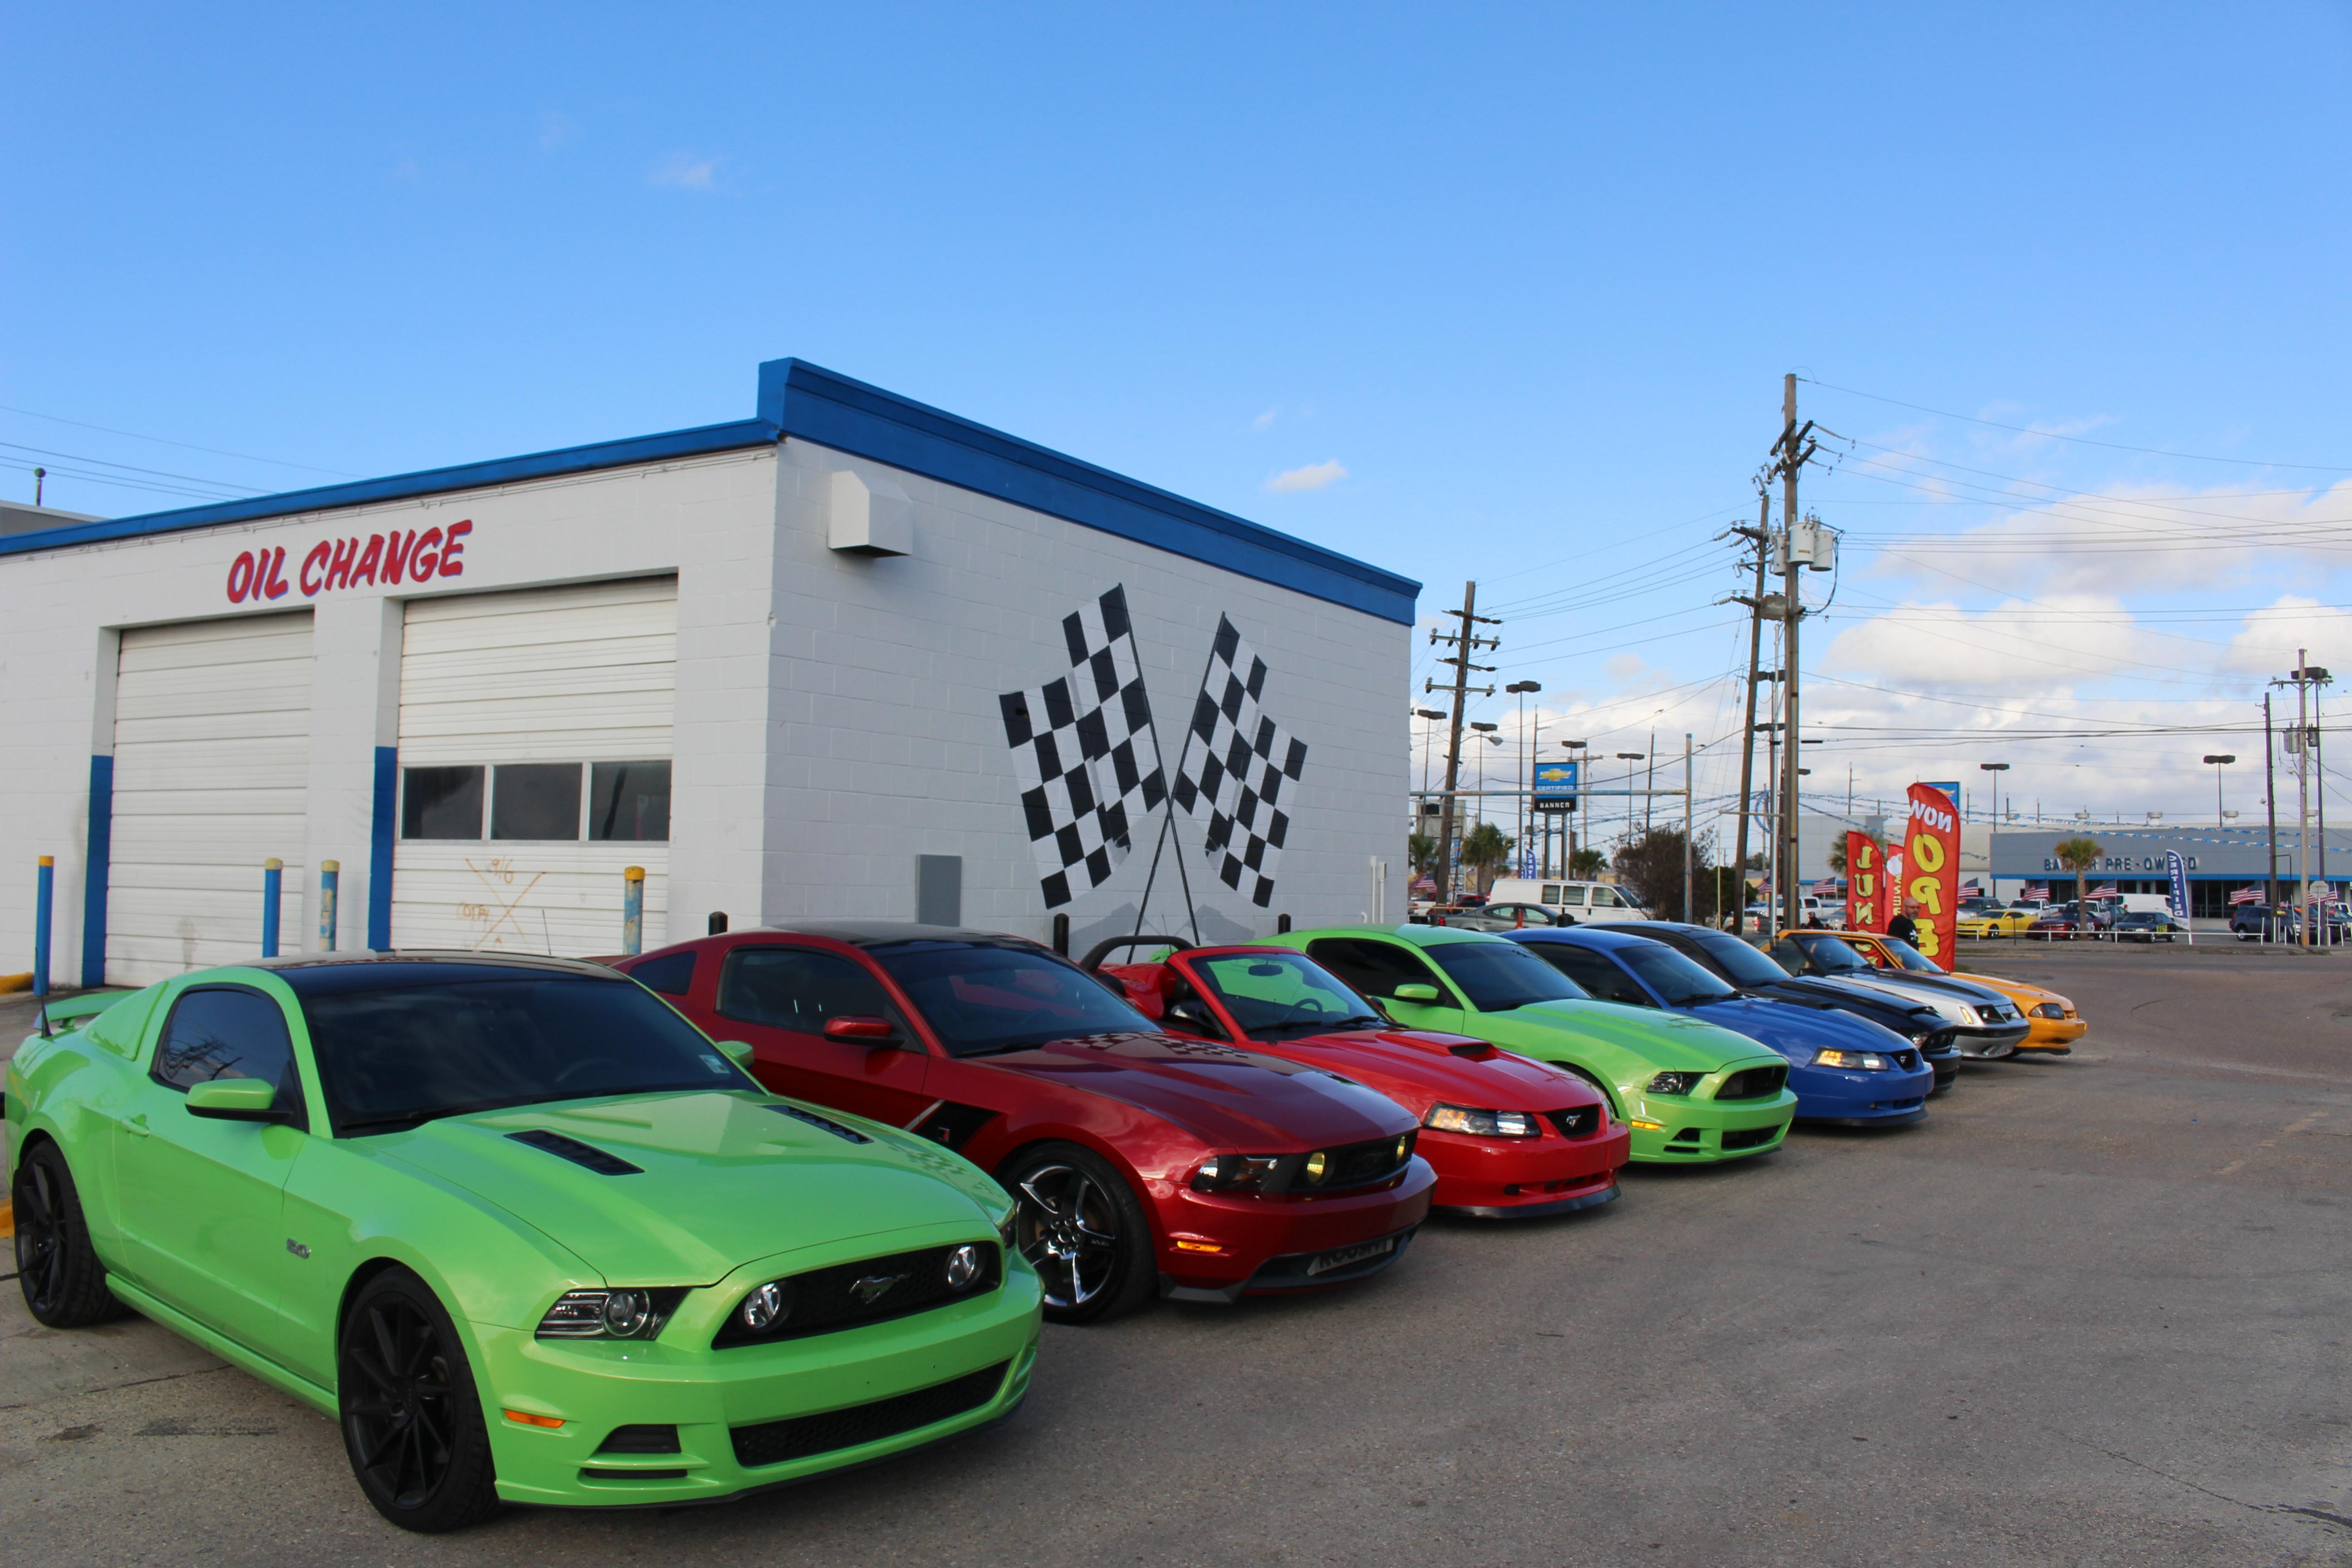 Voodoo Mustangs